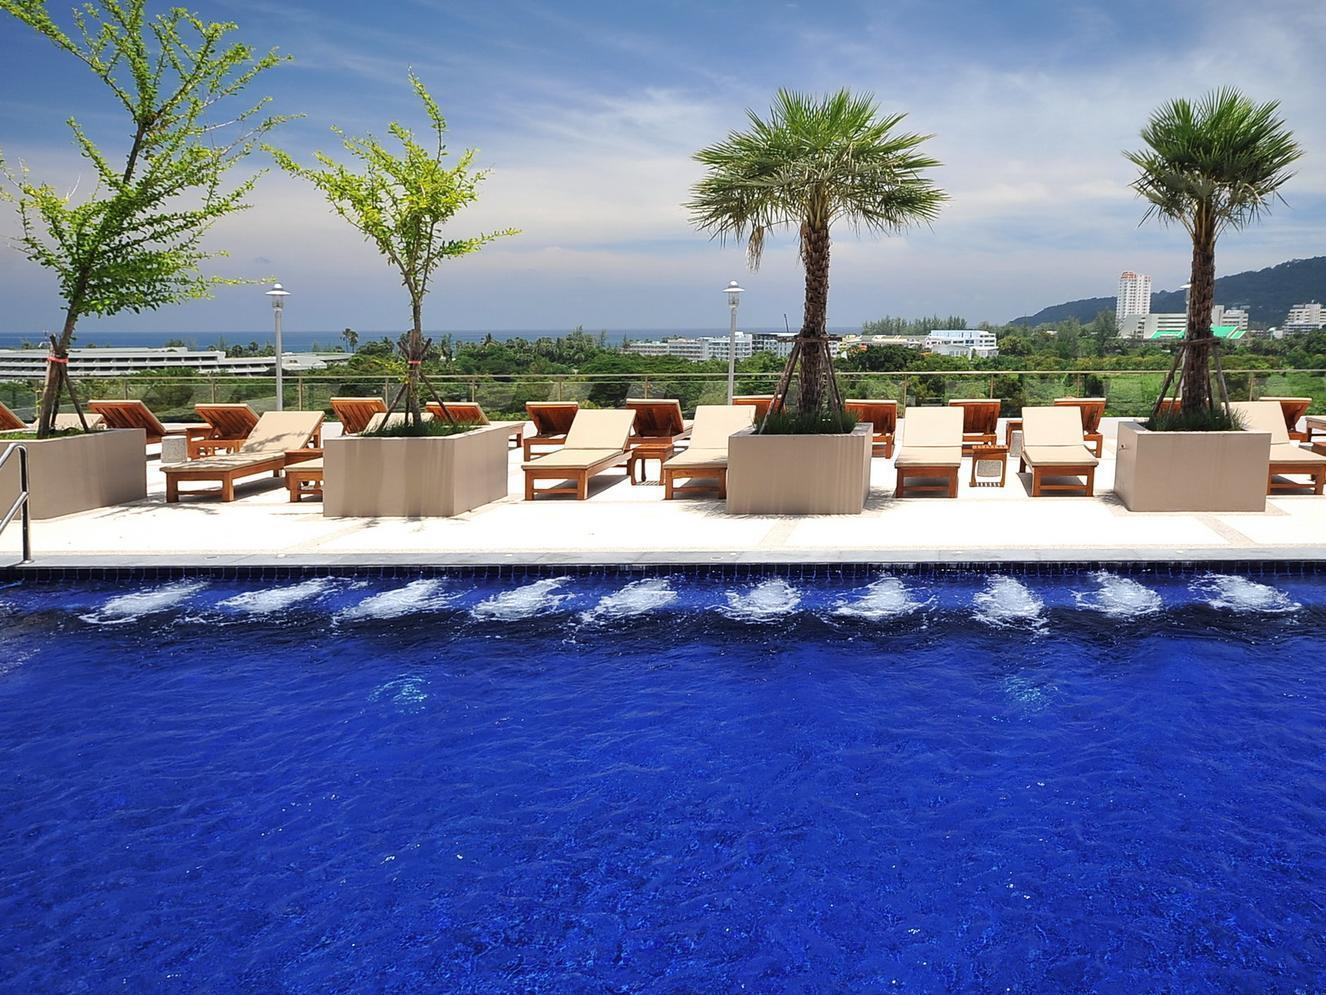 Princess Seaview Resort & Spa ปรินเซส ซีวิว รีสอร์ท แอนด์ สปา